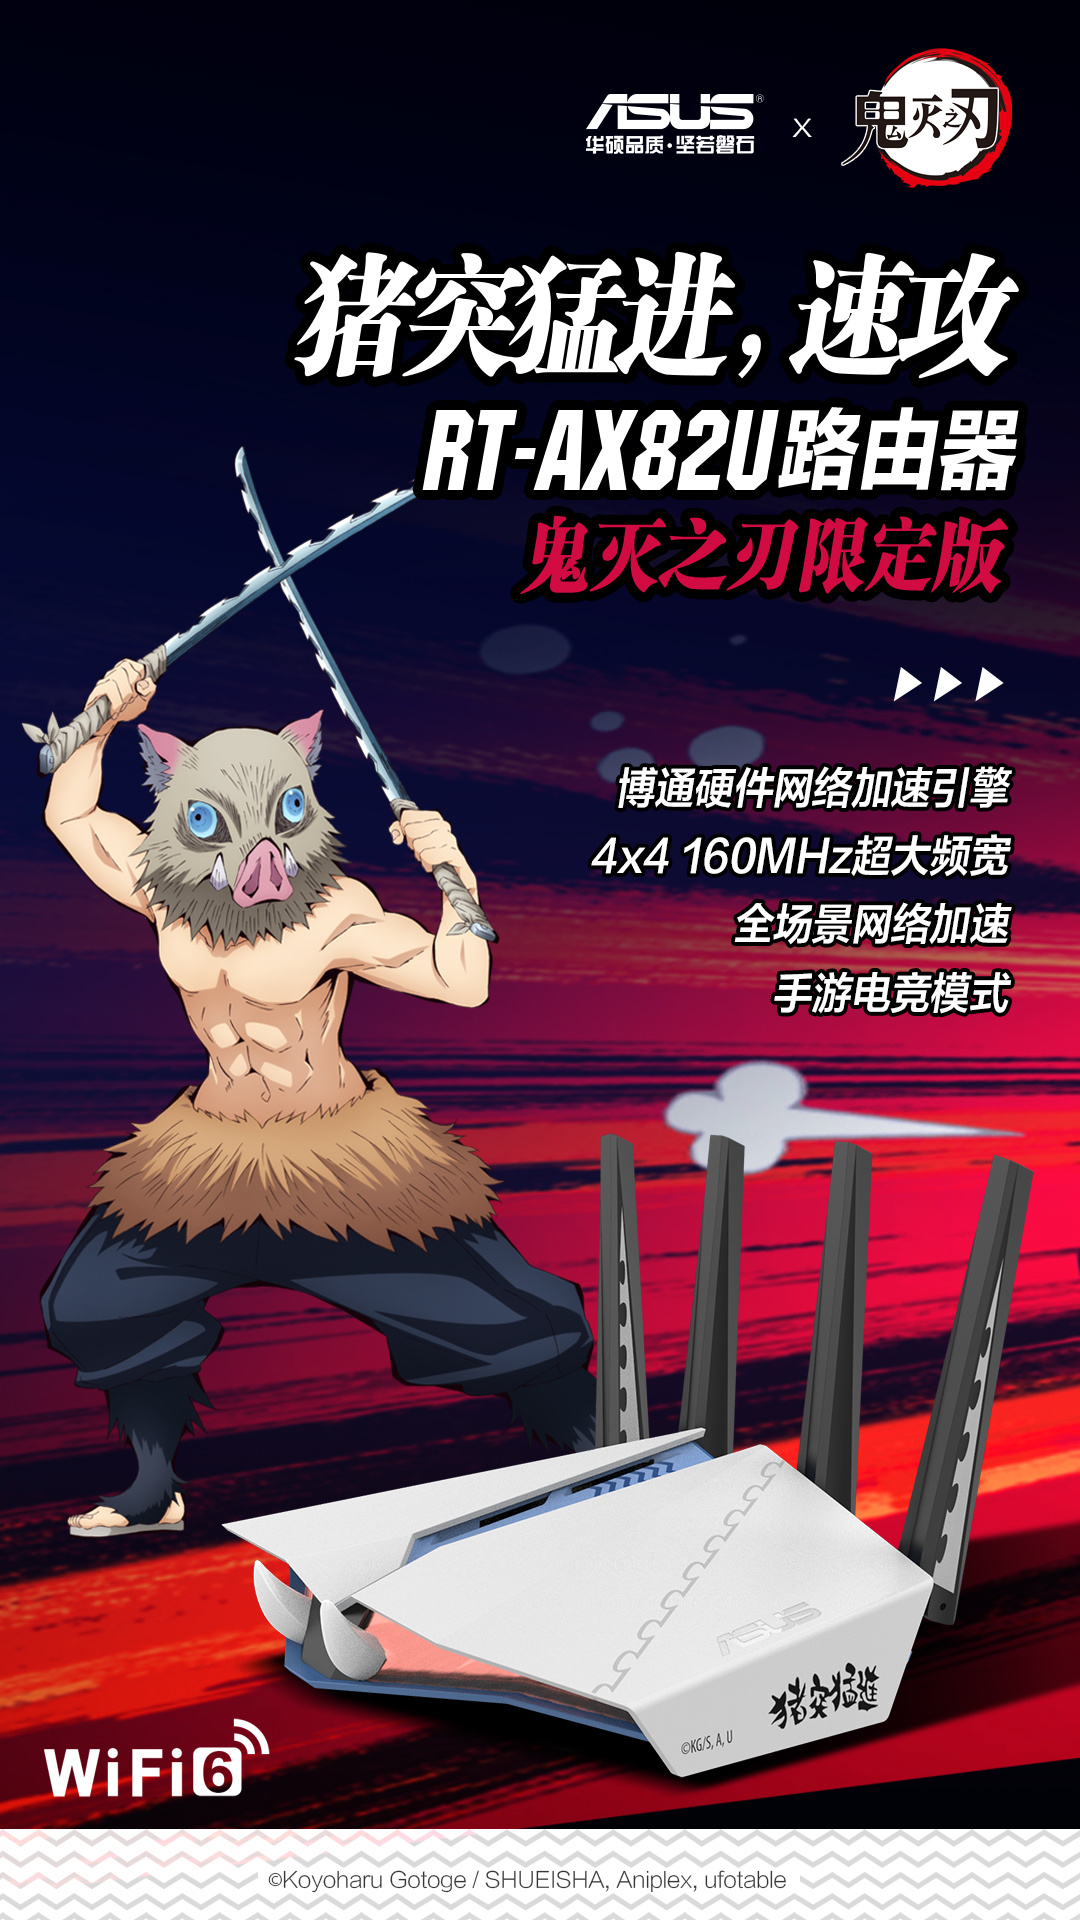 ASUS-Demon-Slayer-10.jpg